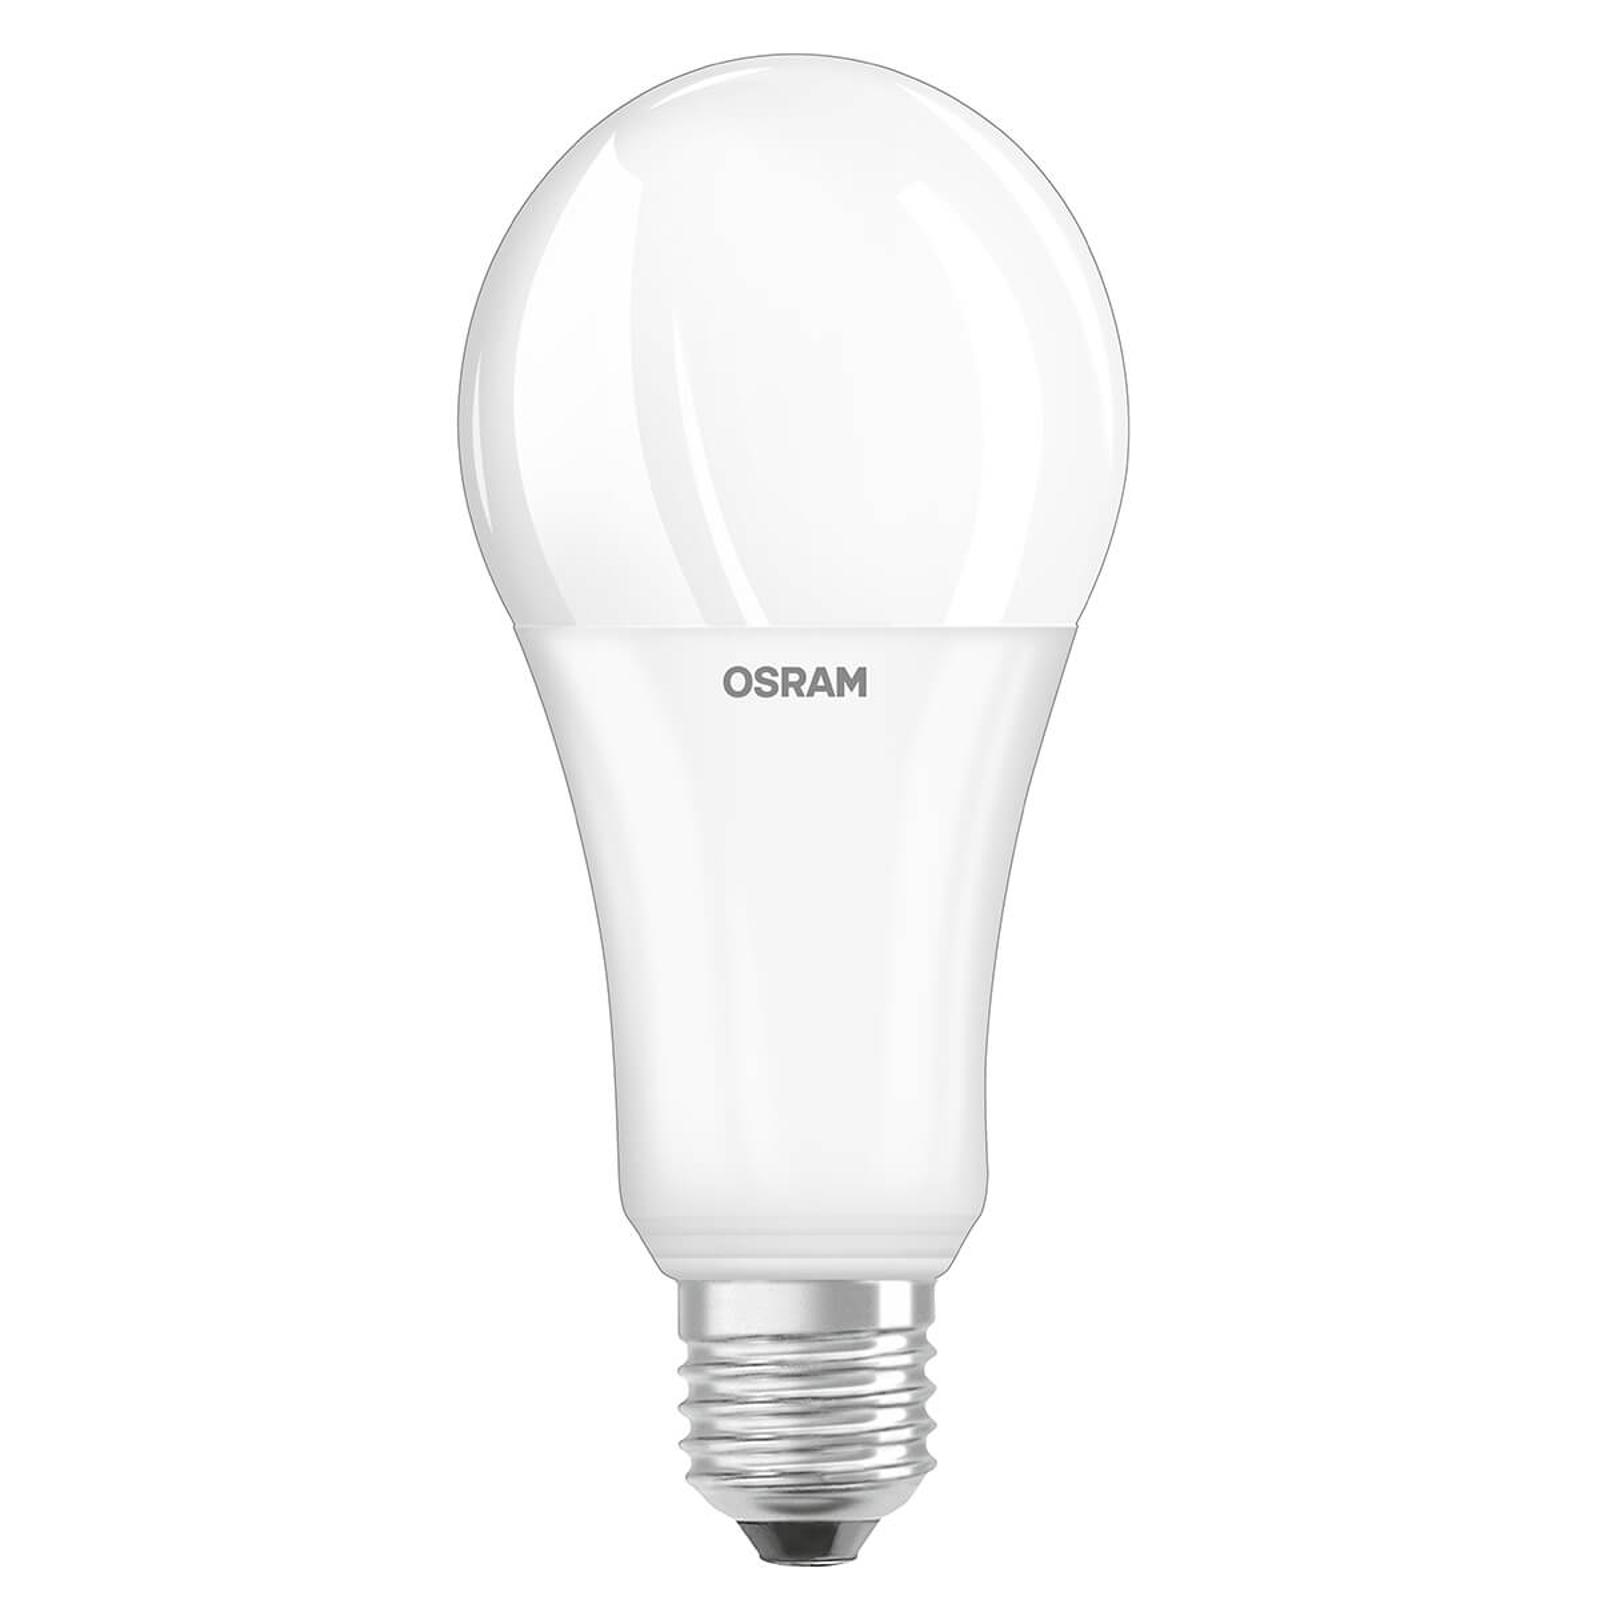 LED-Lampe E27 19W, warmweiß, 2.452 Lumen